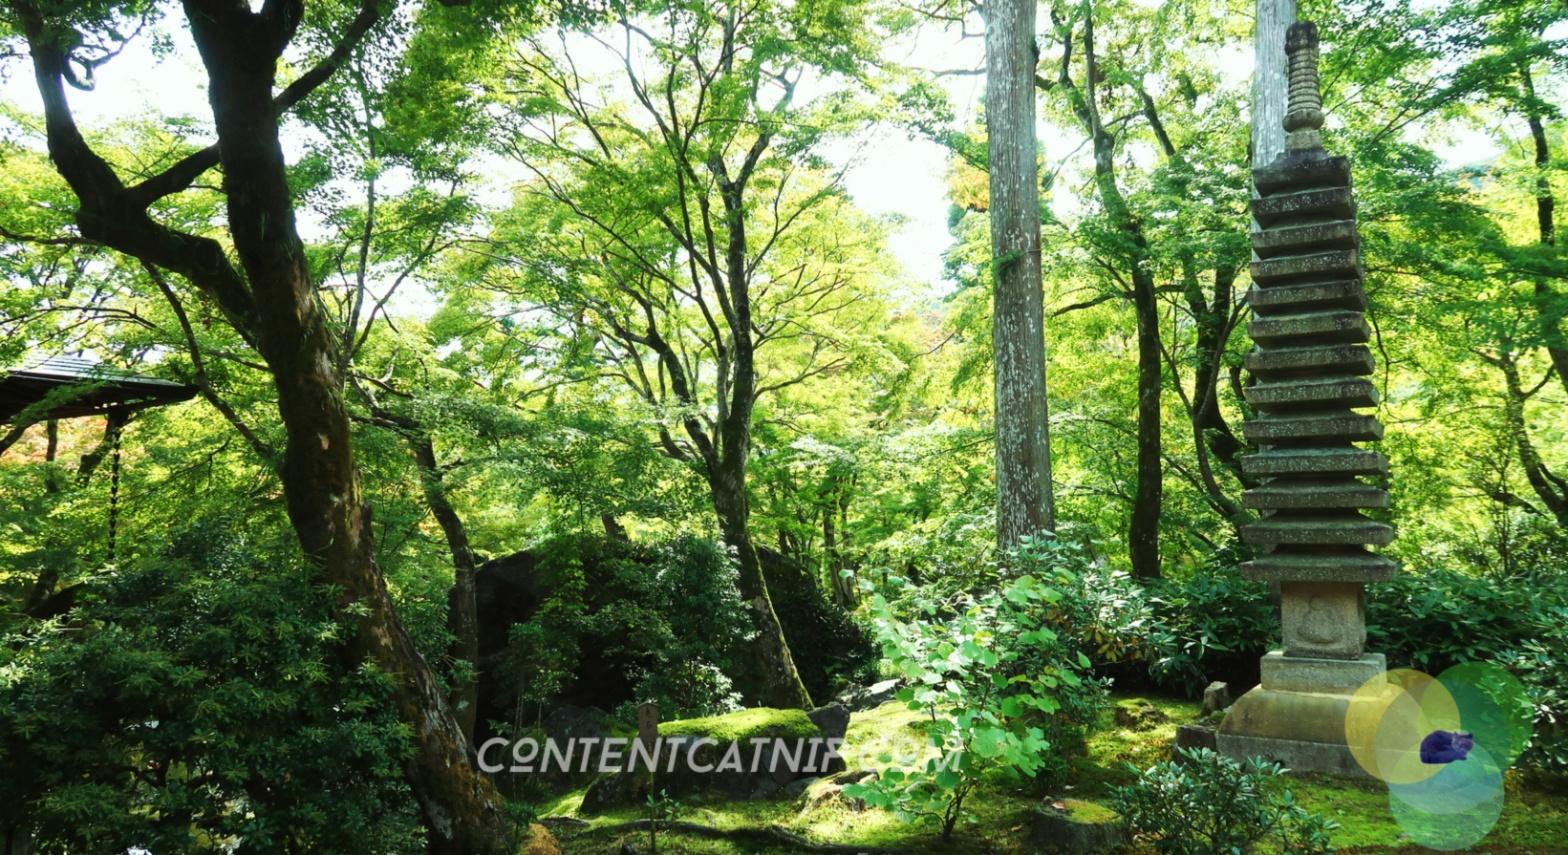 Ryoan-Ji zen garden in Arashiyama, Kyoto. Content Catnip 2018 www.contentcatnip.com